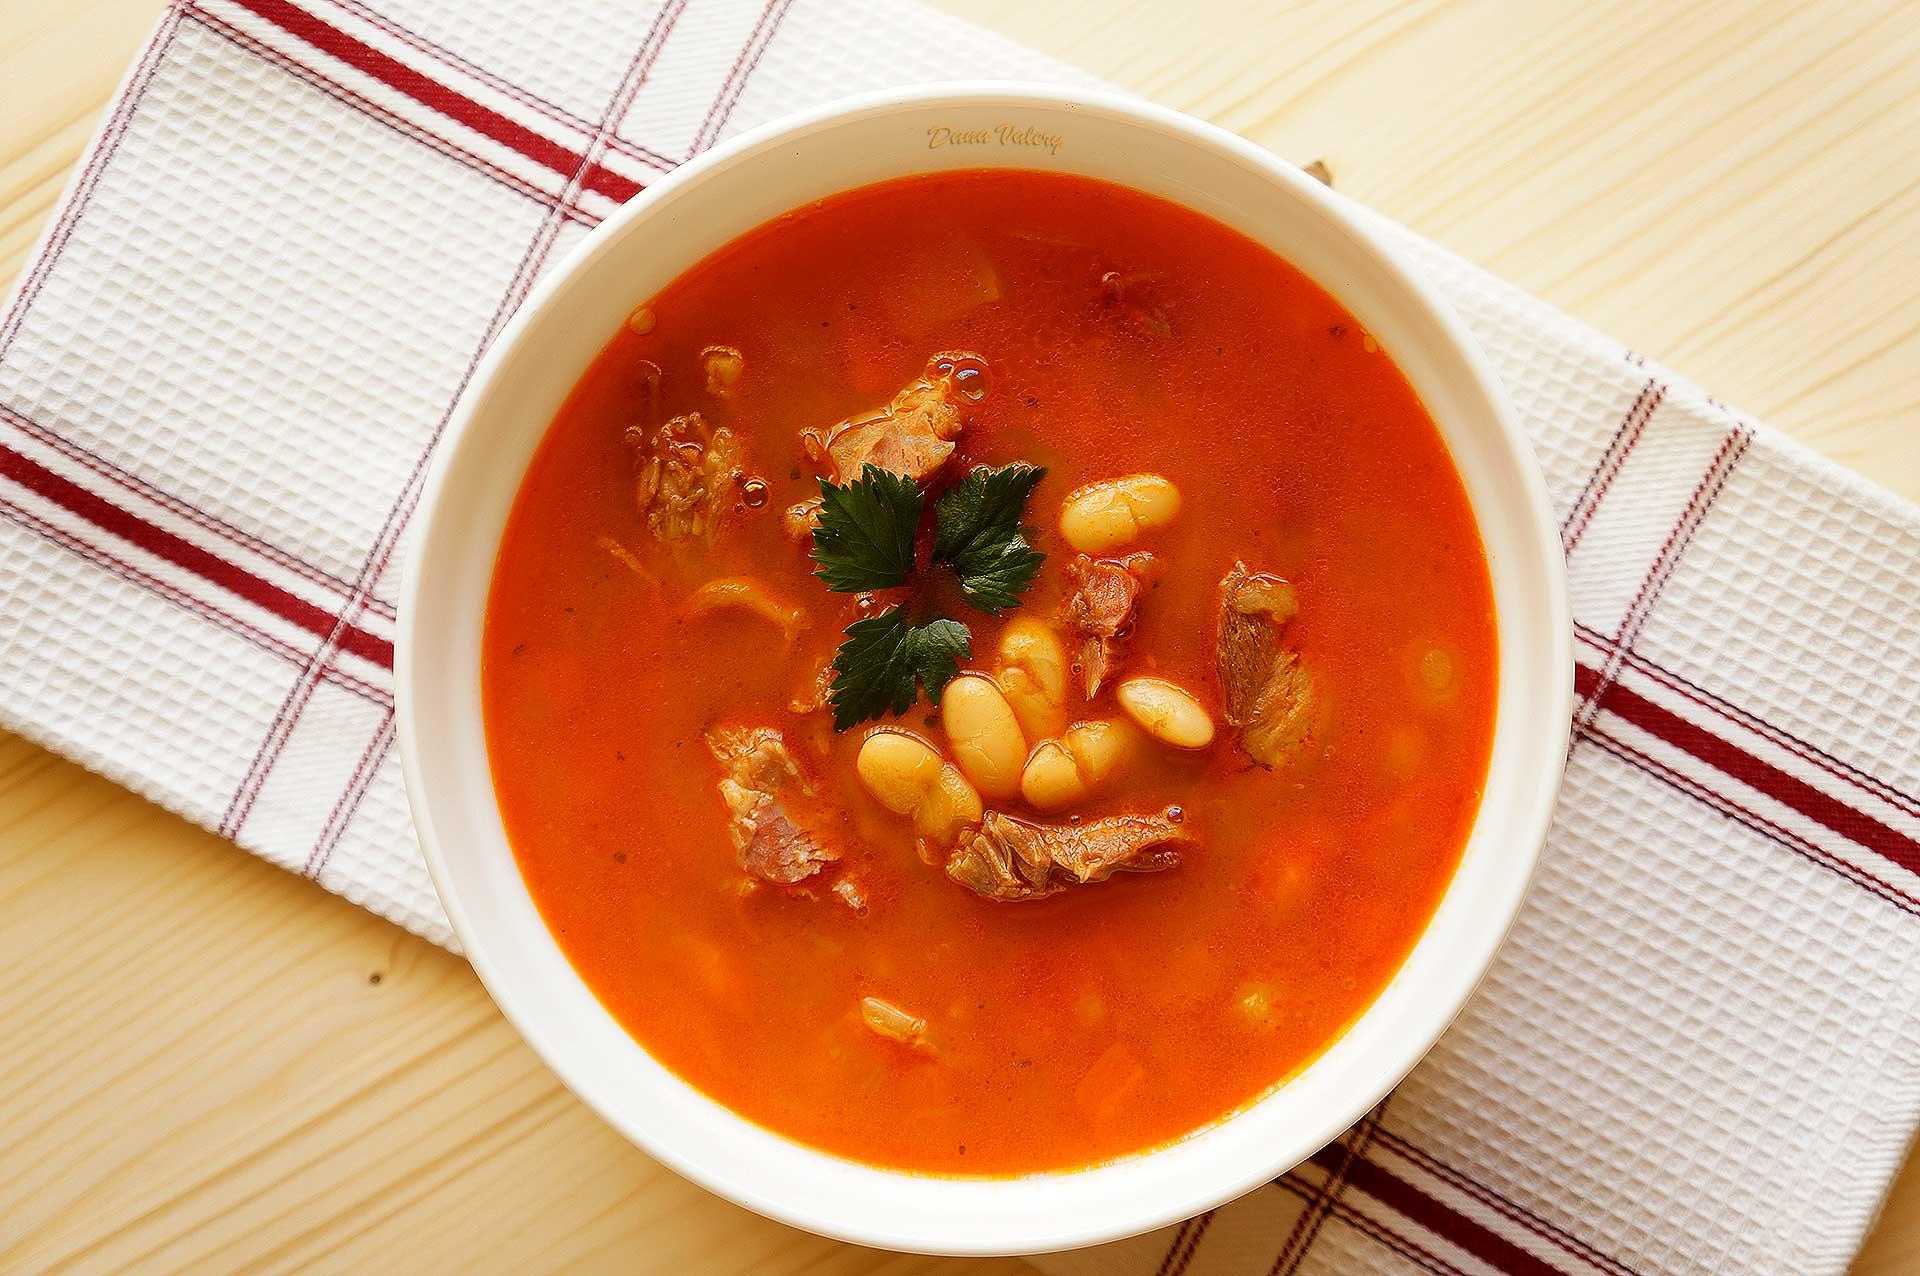 Ciorba De Fasole Boabe Cu Afumatura Si Rantas Retete Culinare Cu Dana Valery